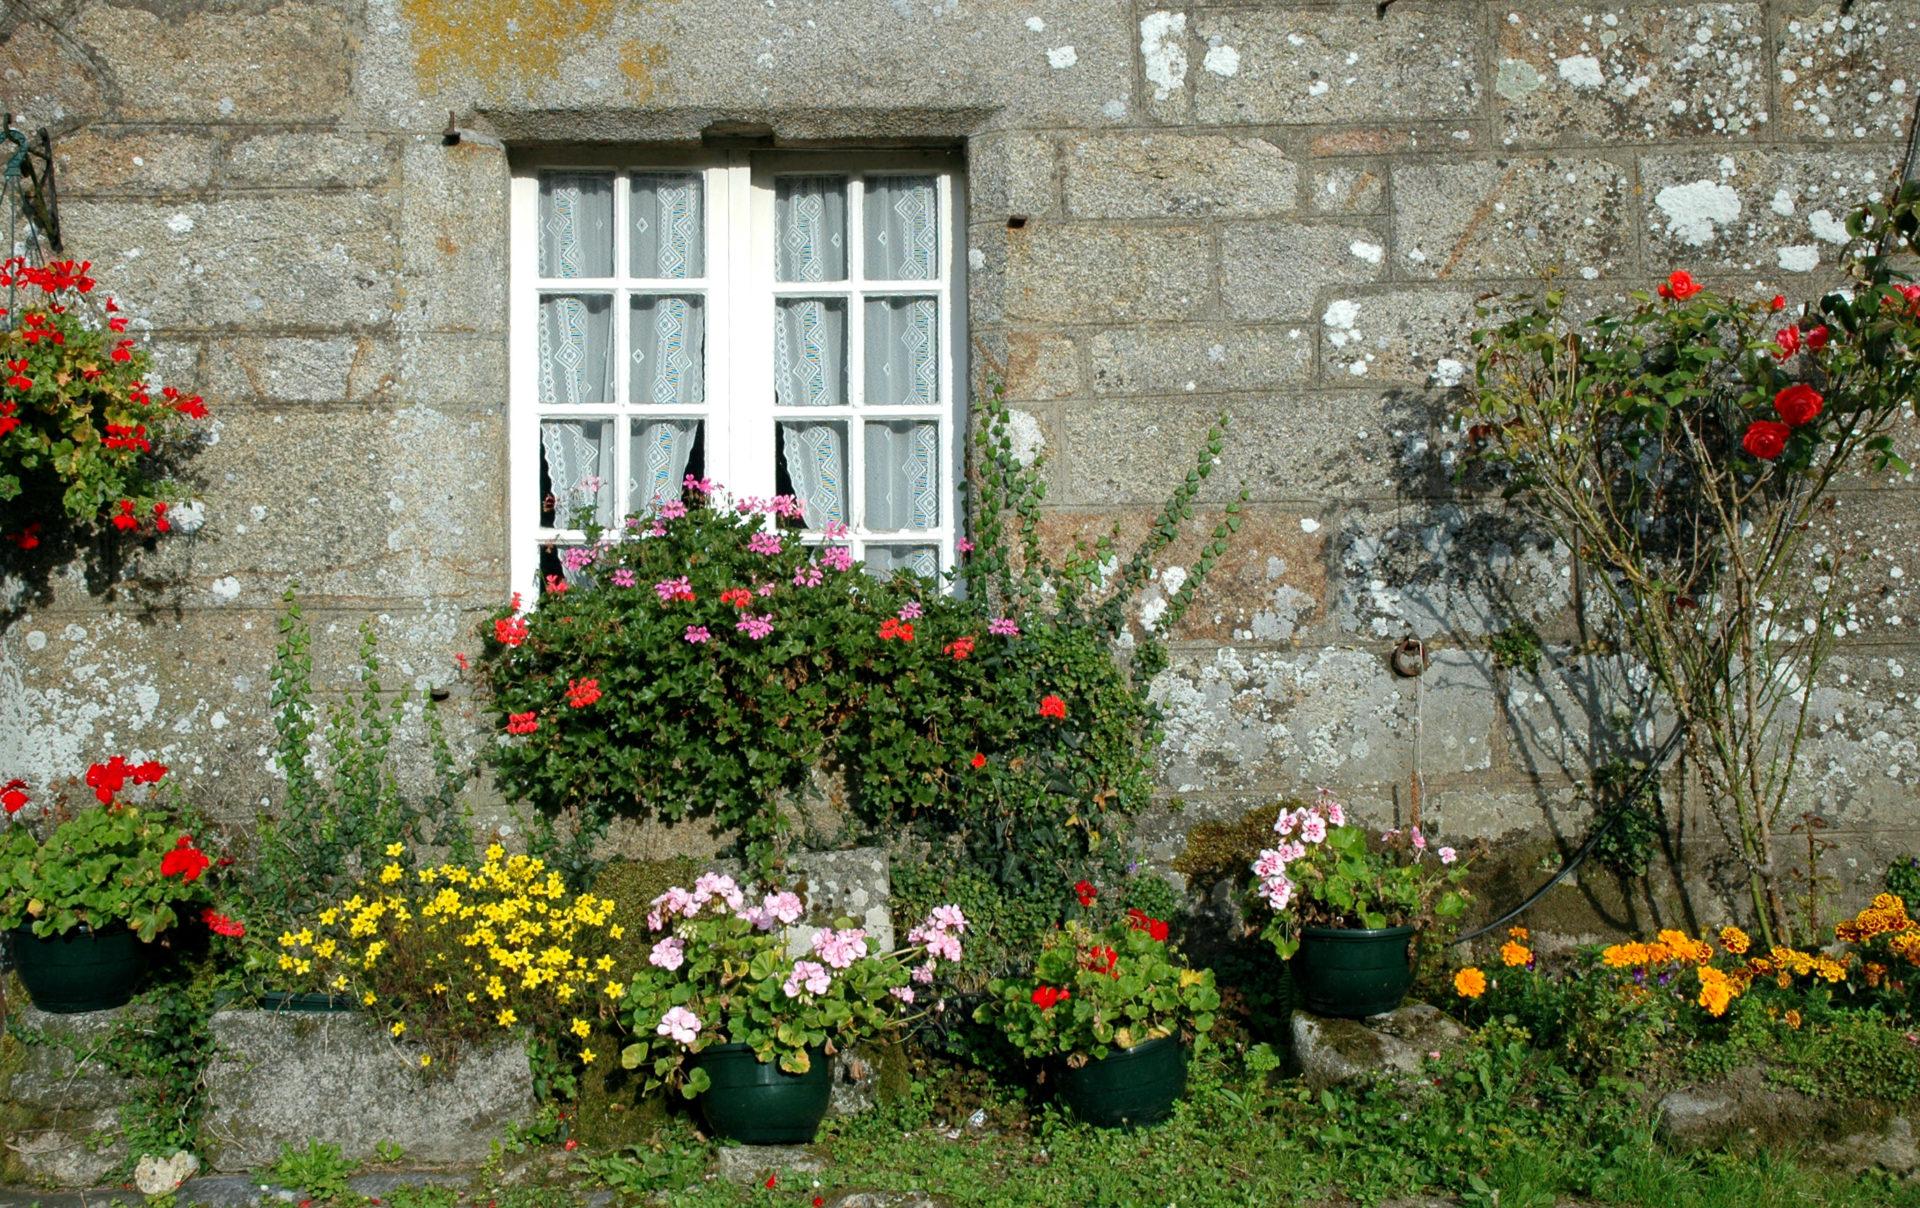 visitare villaggio caratteristico locronan bretagna francia